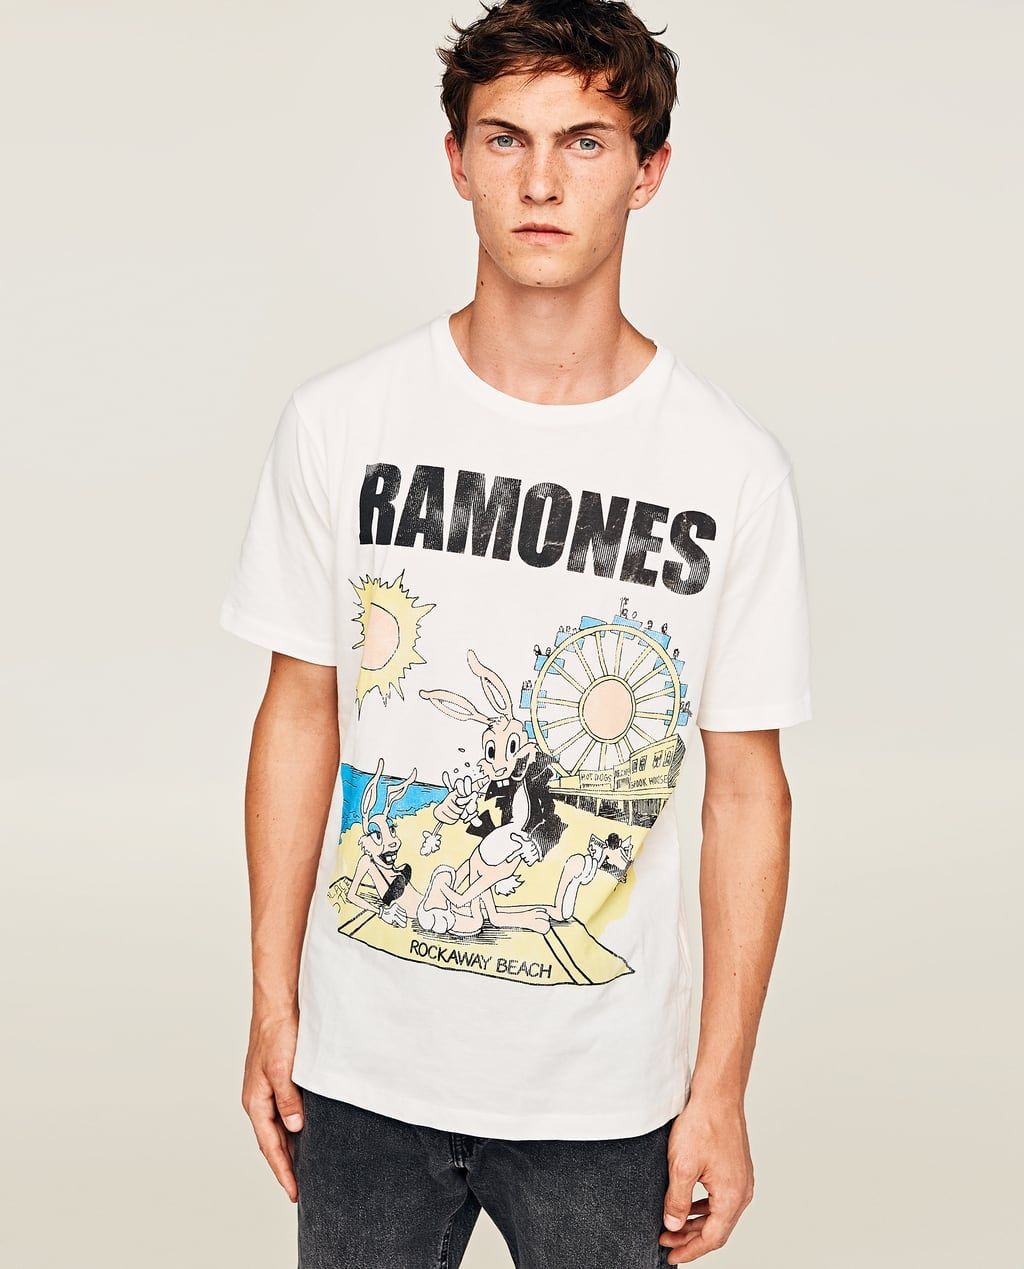 "72fed2e1856e back to the future™"" sweatshirt | T-Shirts | Ramones t shirt, Shirts ..."